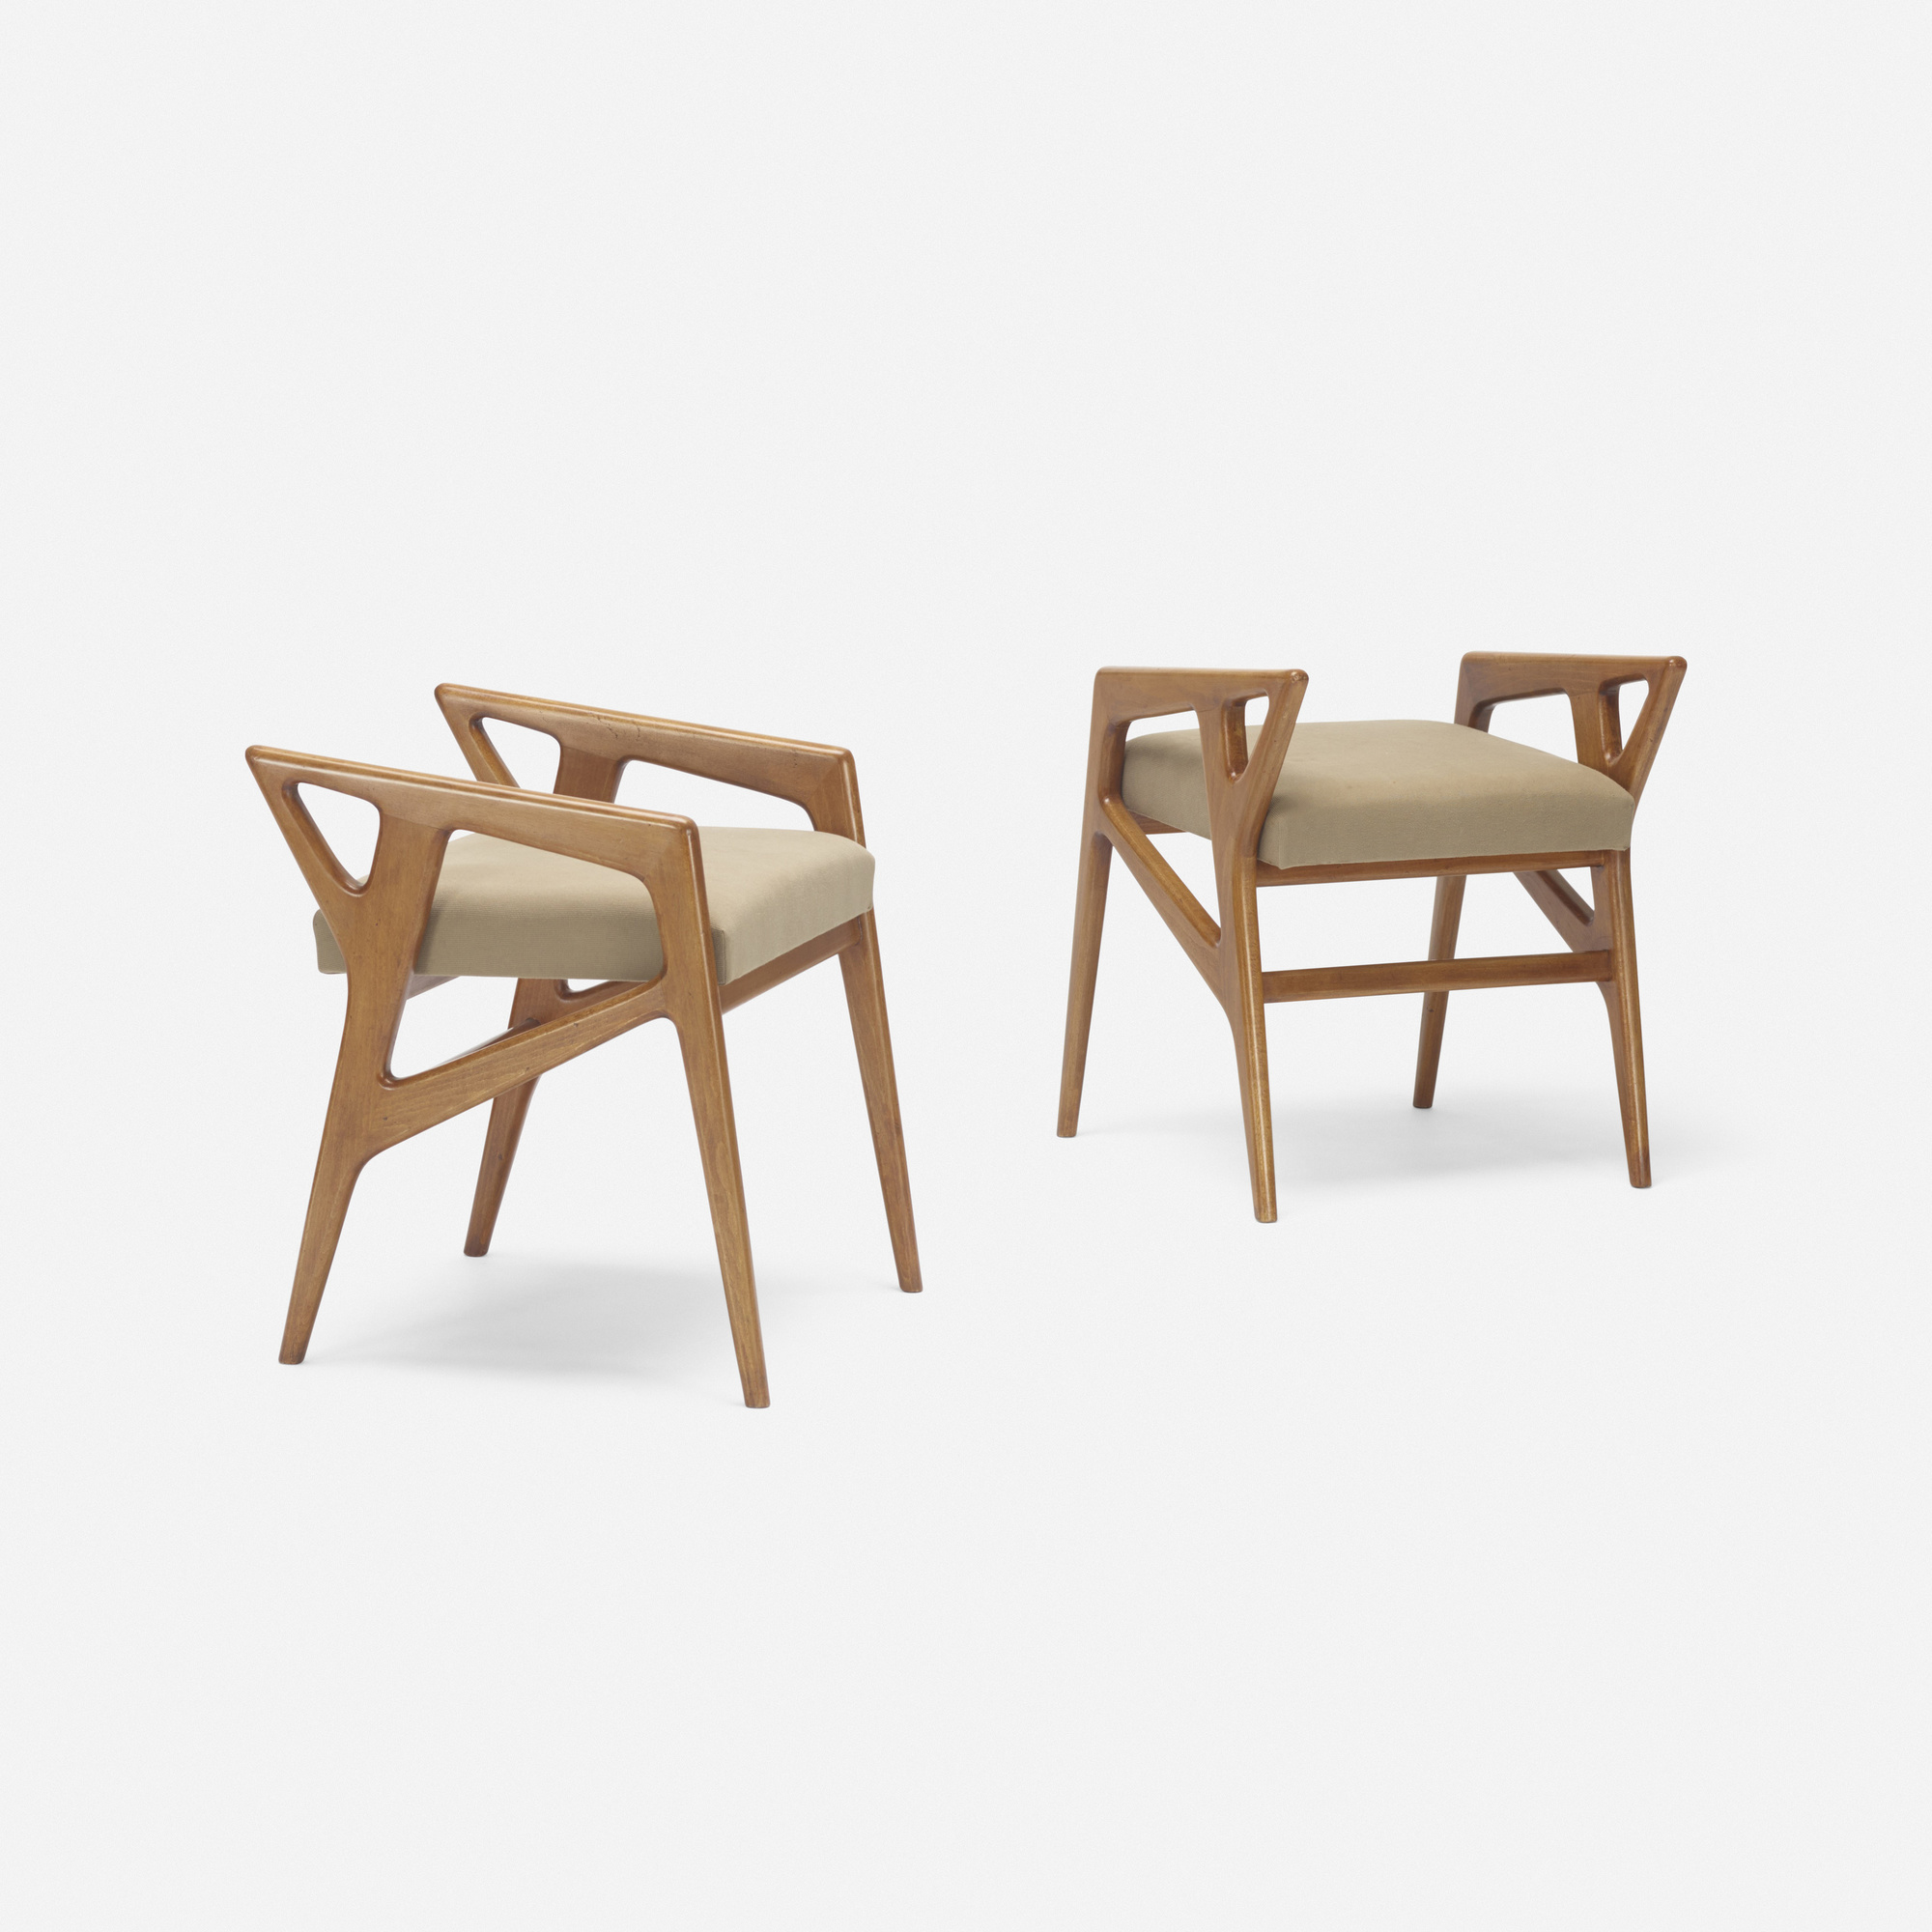 202: Gio Ponti / benches, pair (2 of 3)